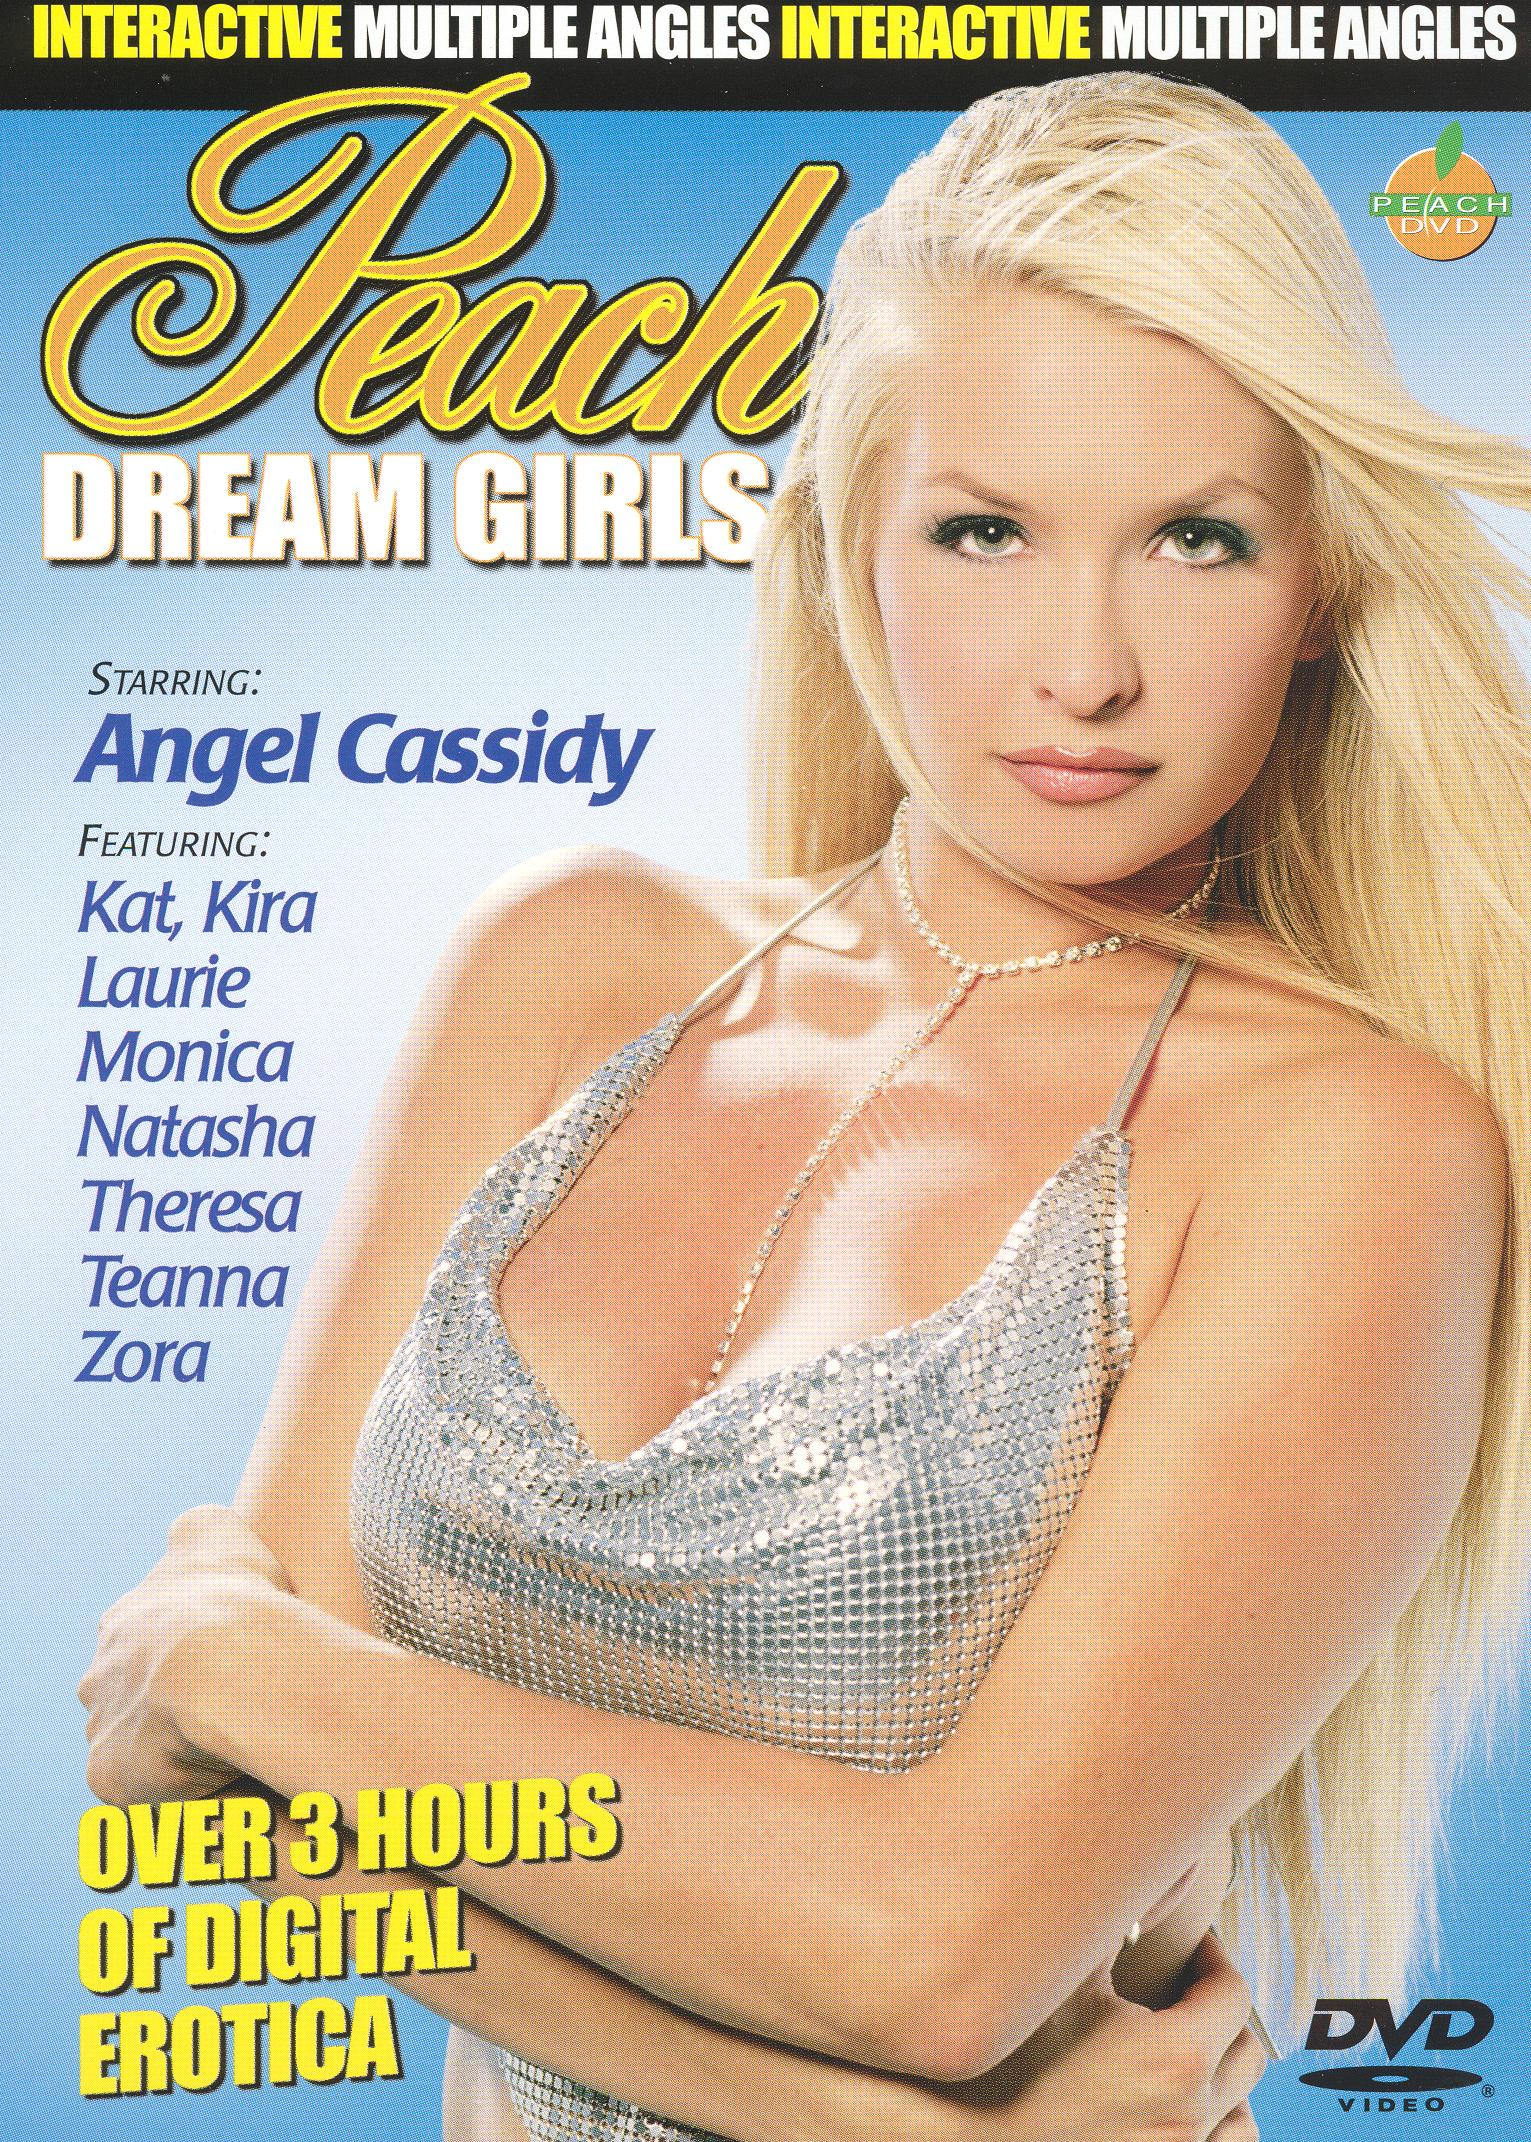 Peach Dream Girls: Angel Cassidy